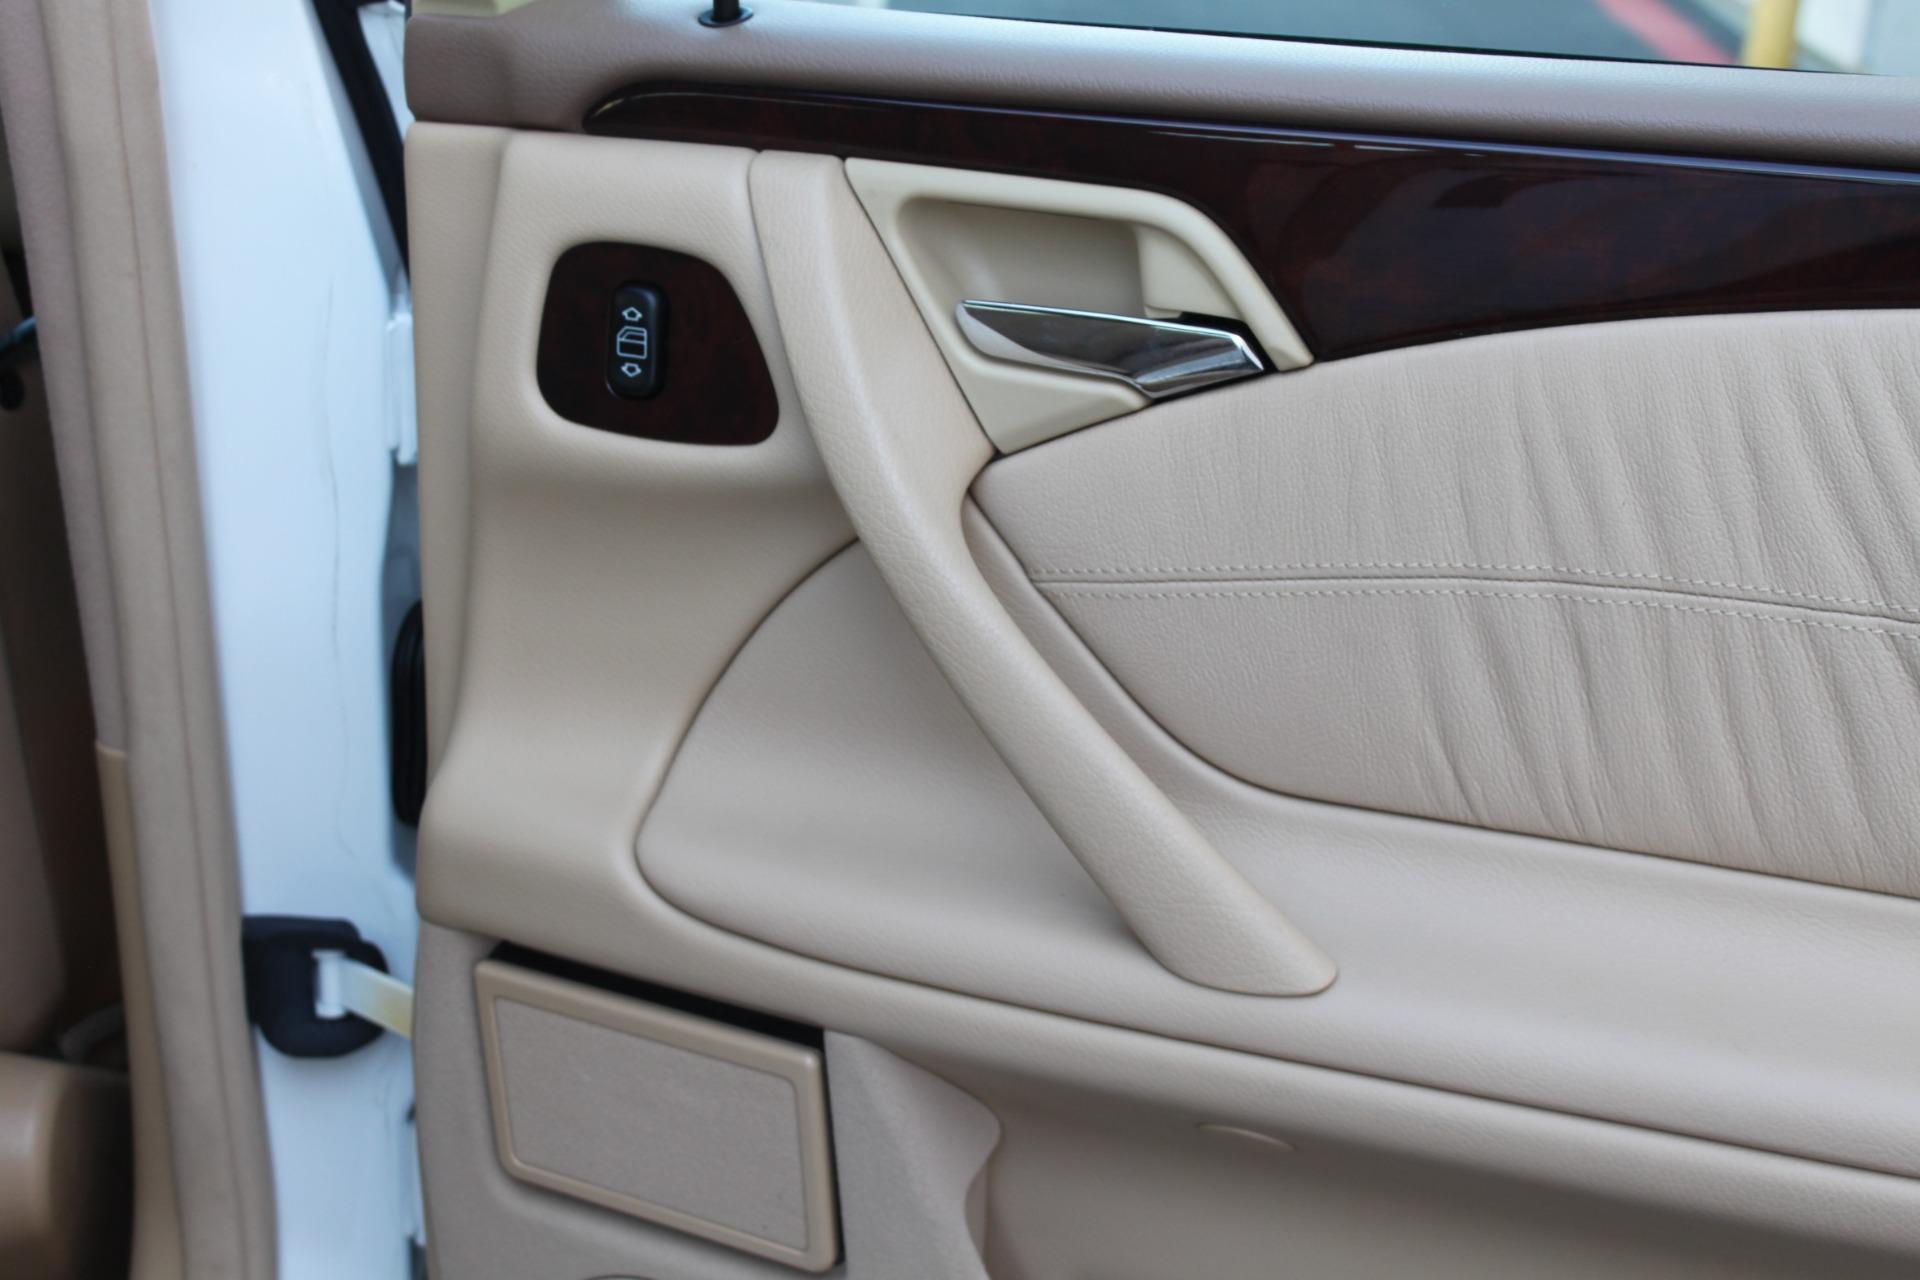 Used-2000-Mercedes-Benz-E-Class-Wagon-Camaro